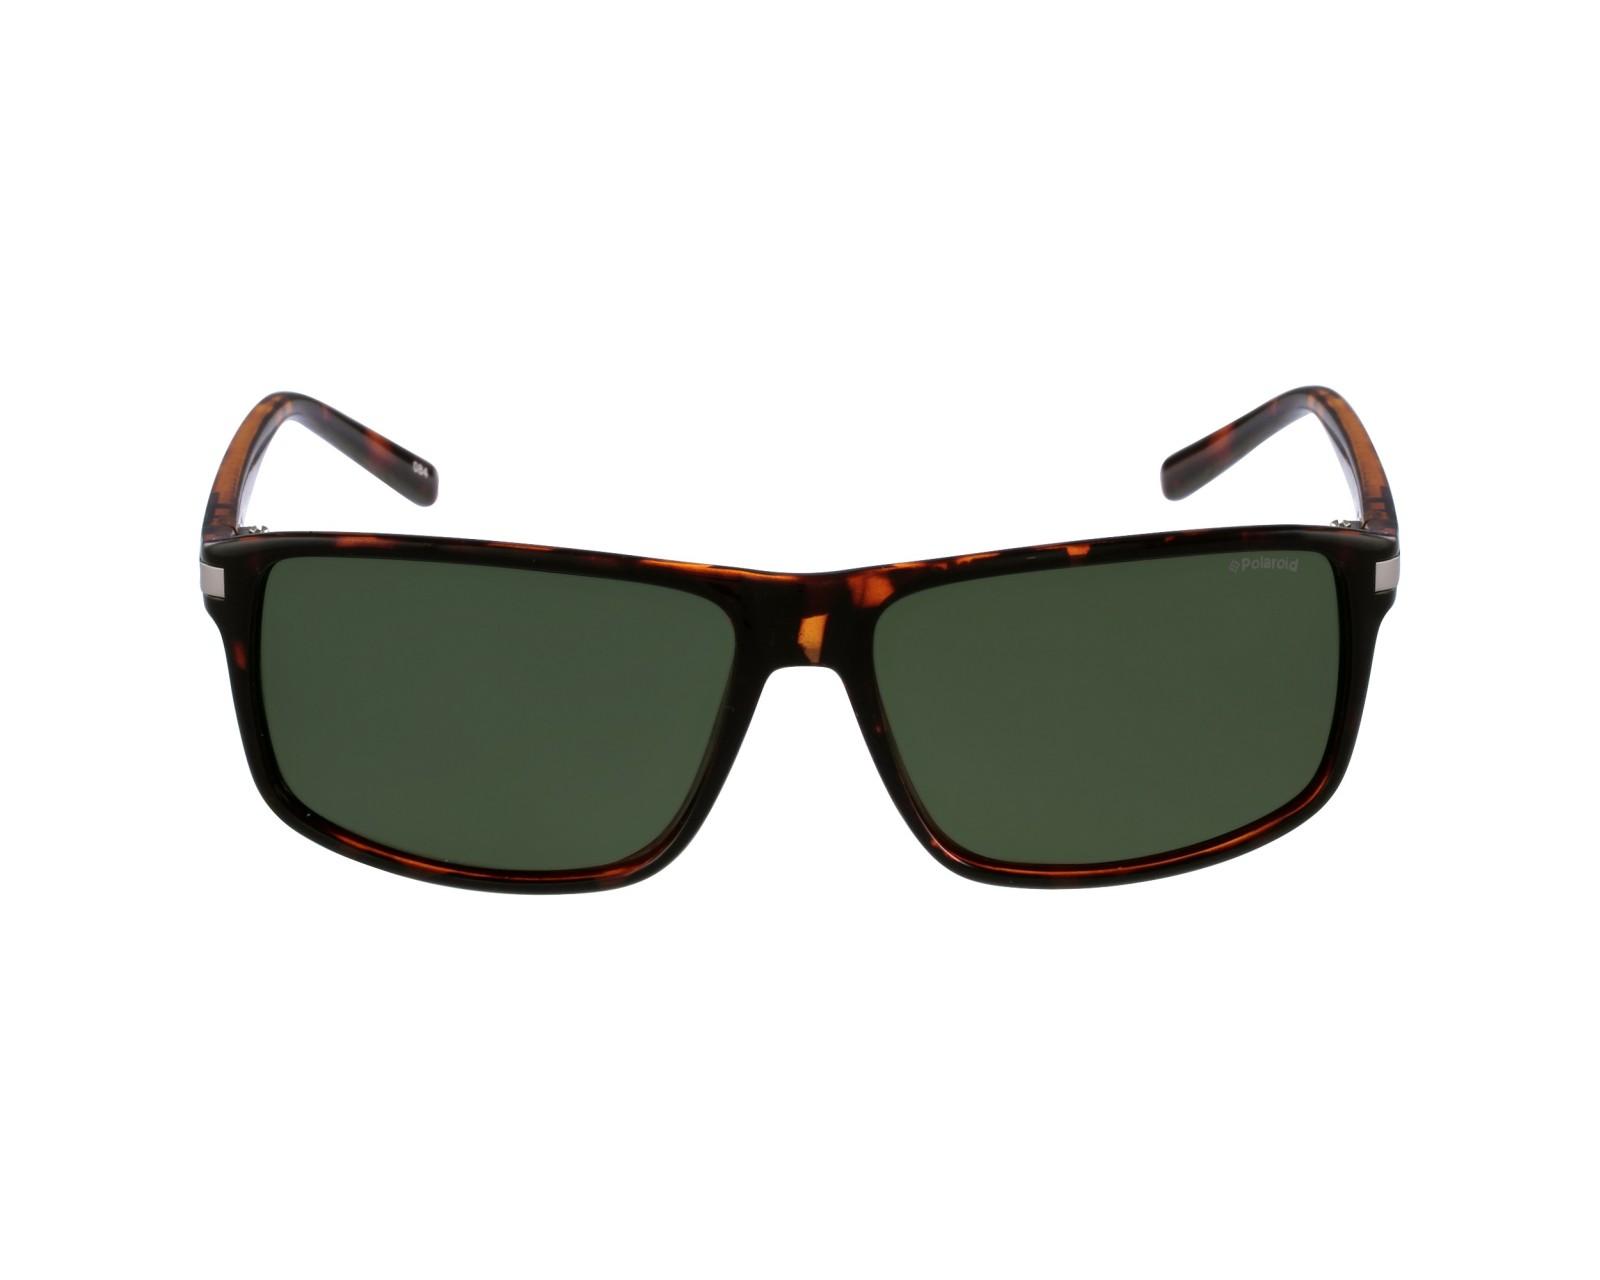 Polaroid Sunglasses PLD-2019-S PZO/H8 Havana